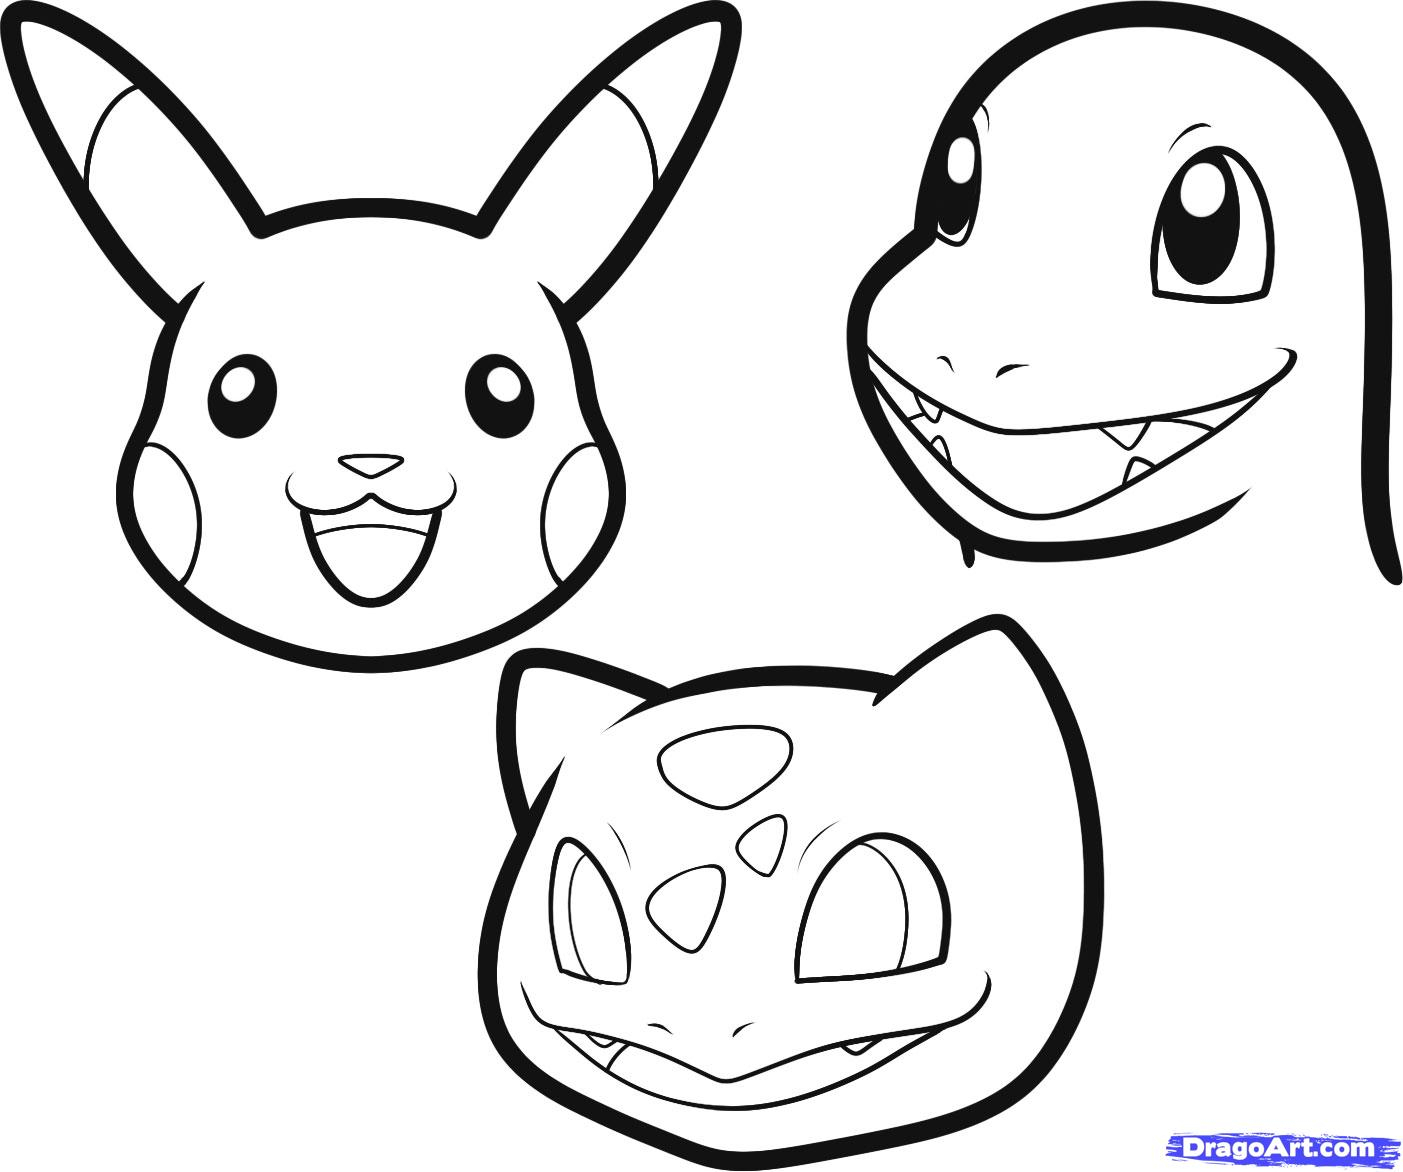 1403x1172 Easy Cartoon Drawings